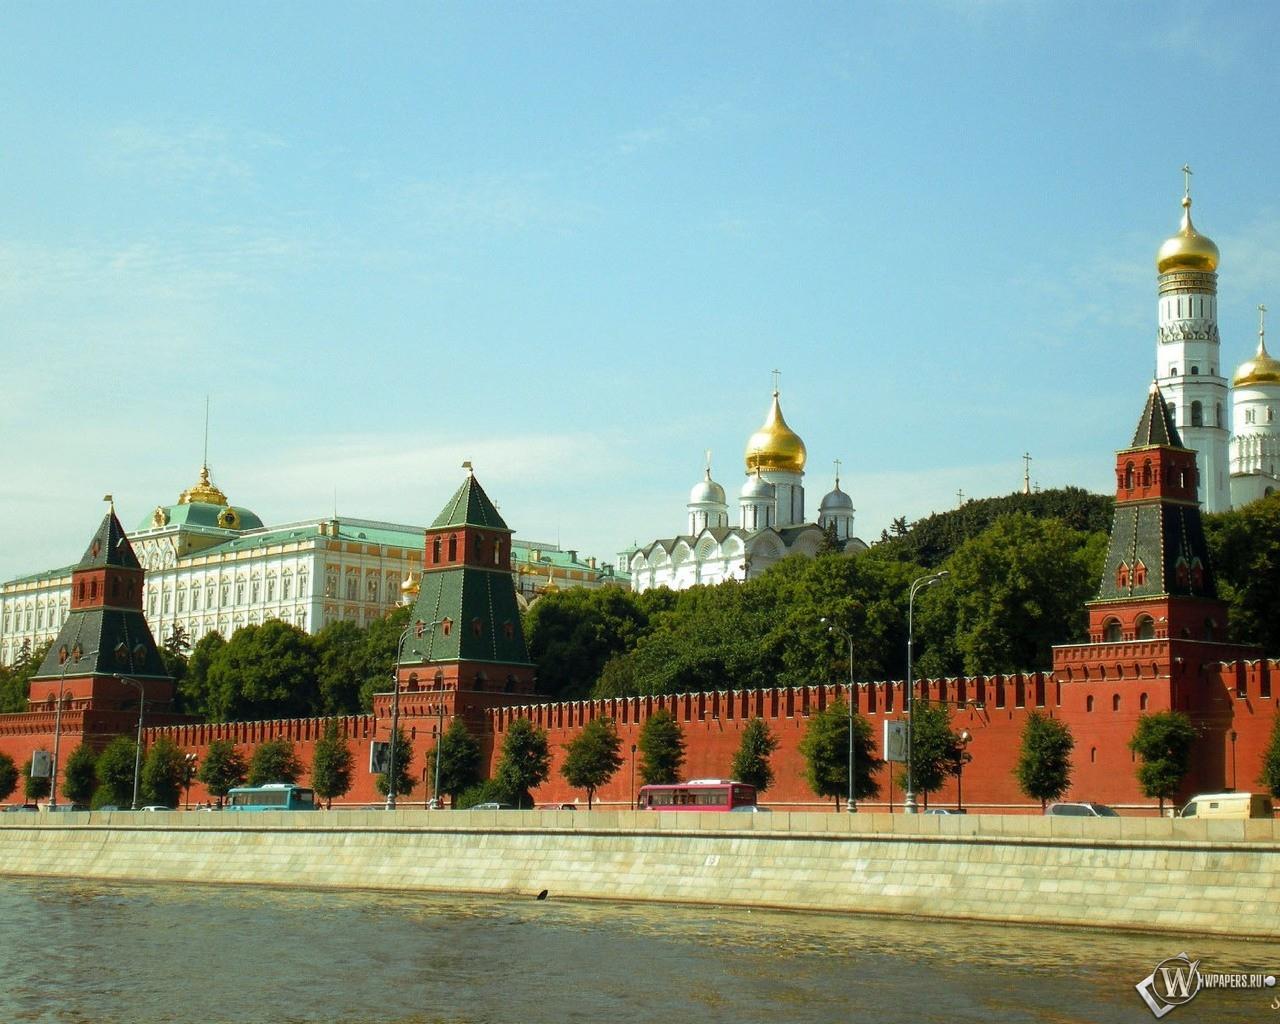 Кремлёвская стена (Москва) 1280x1024